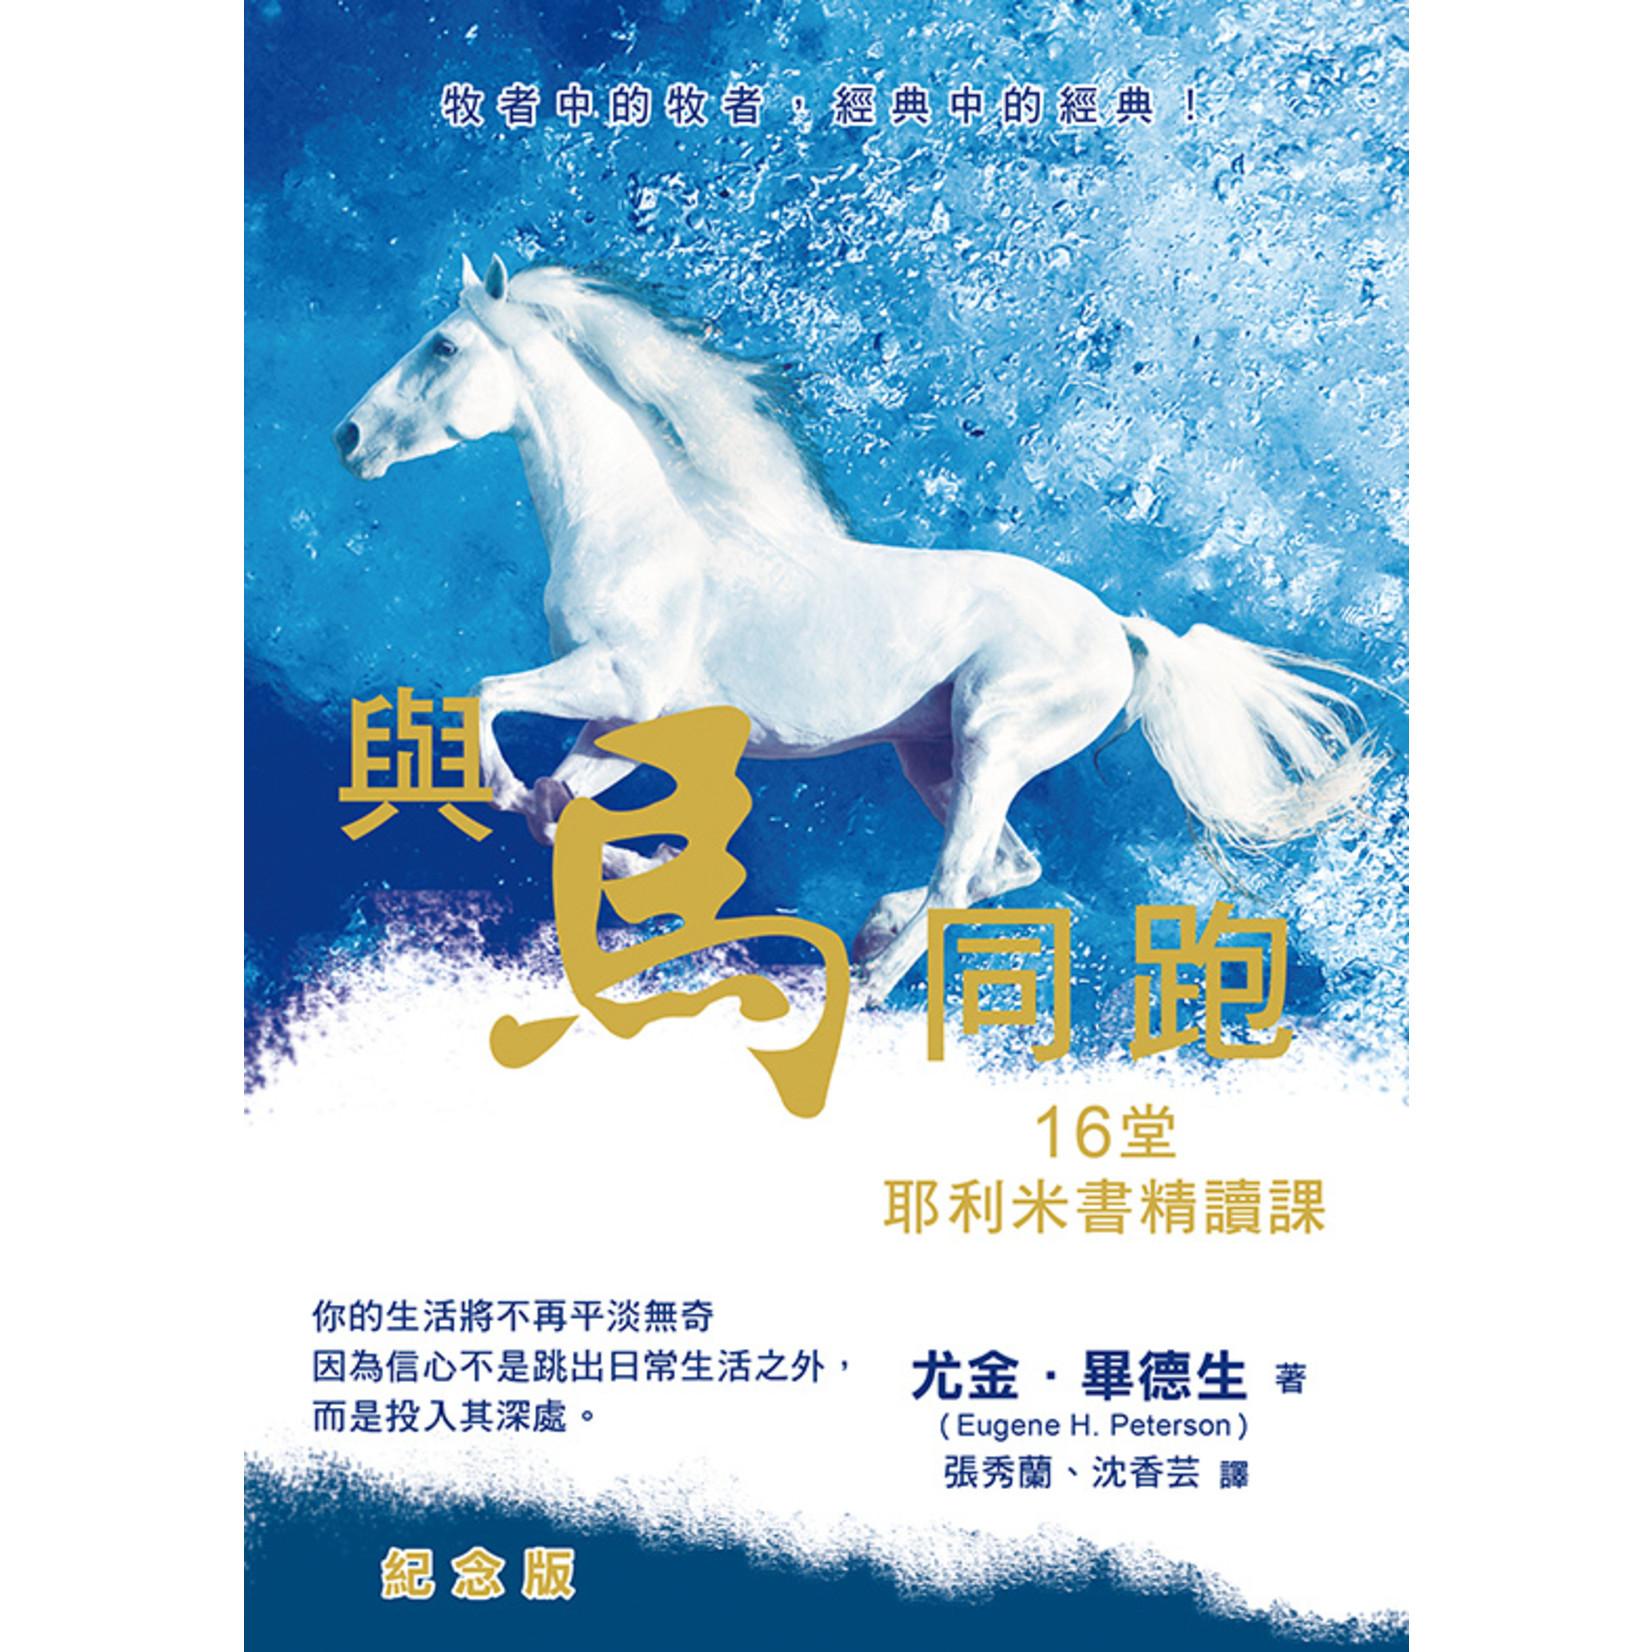 中國主日學協會 China Sunday School Association 與馬同跑:16堂耶利米書精讀課(紀念版) Run with the horses: the quest for life at its best